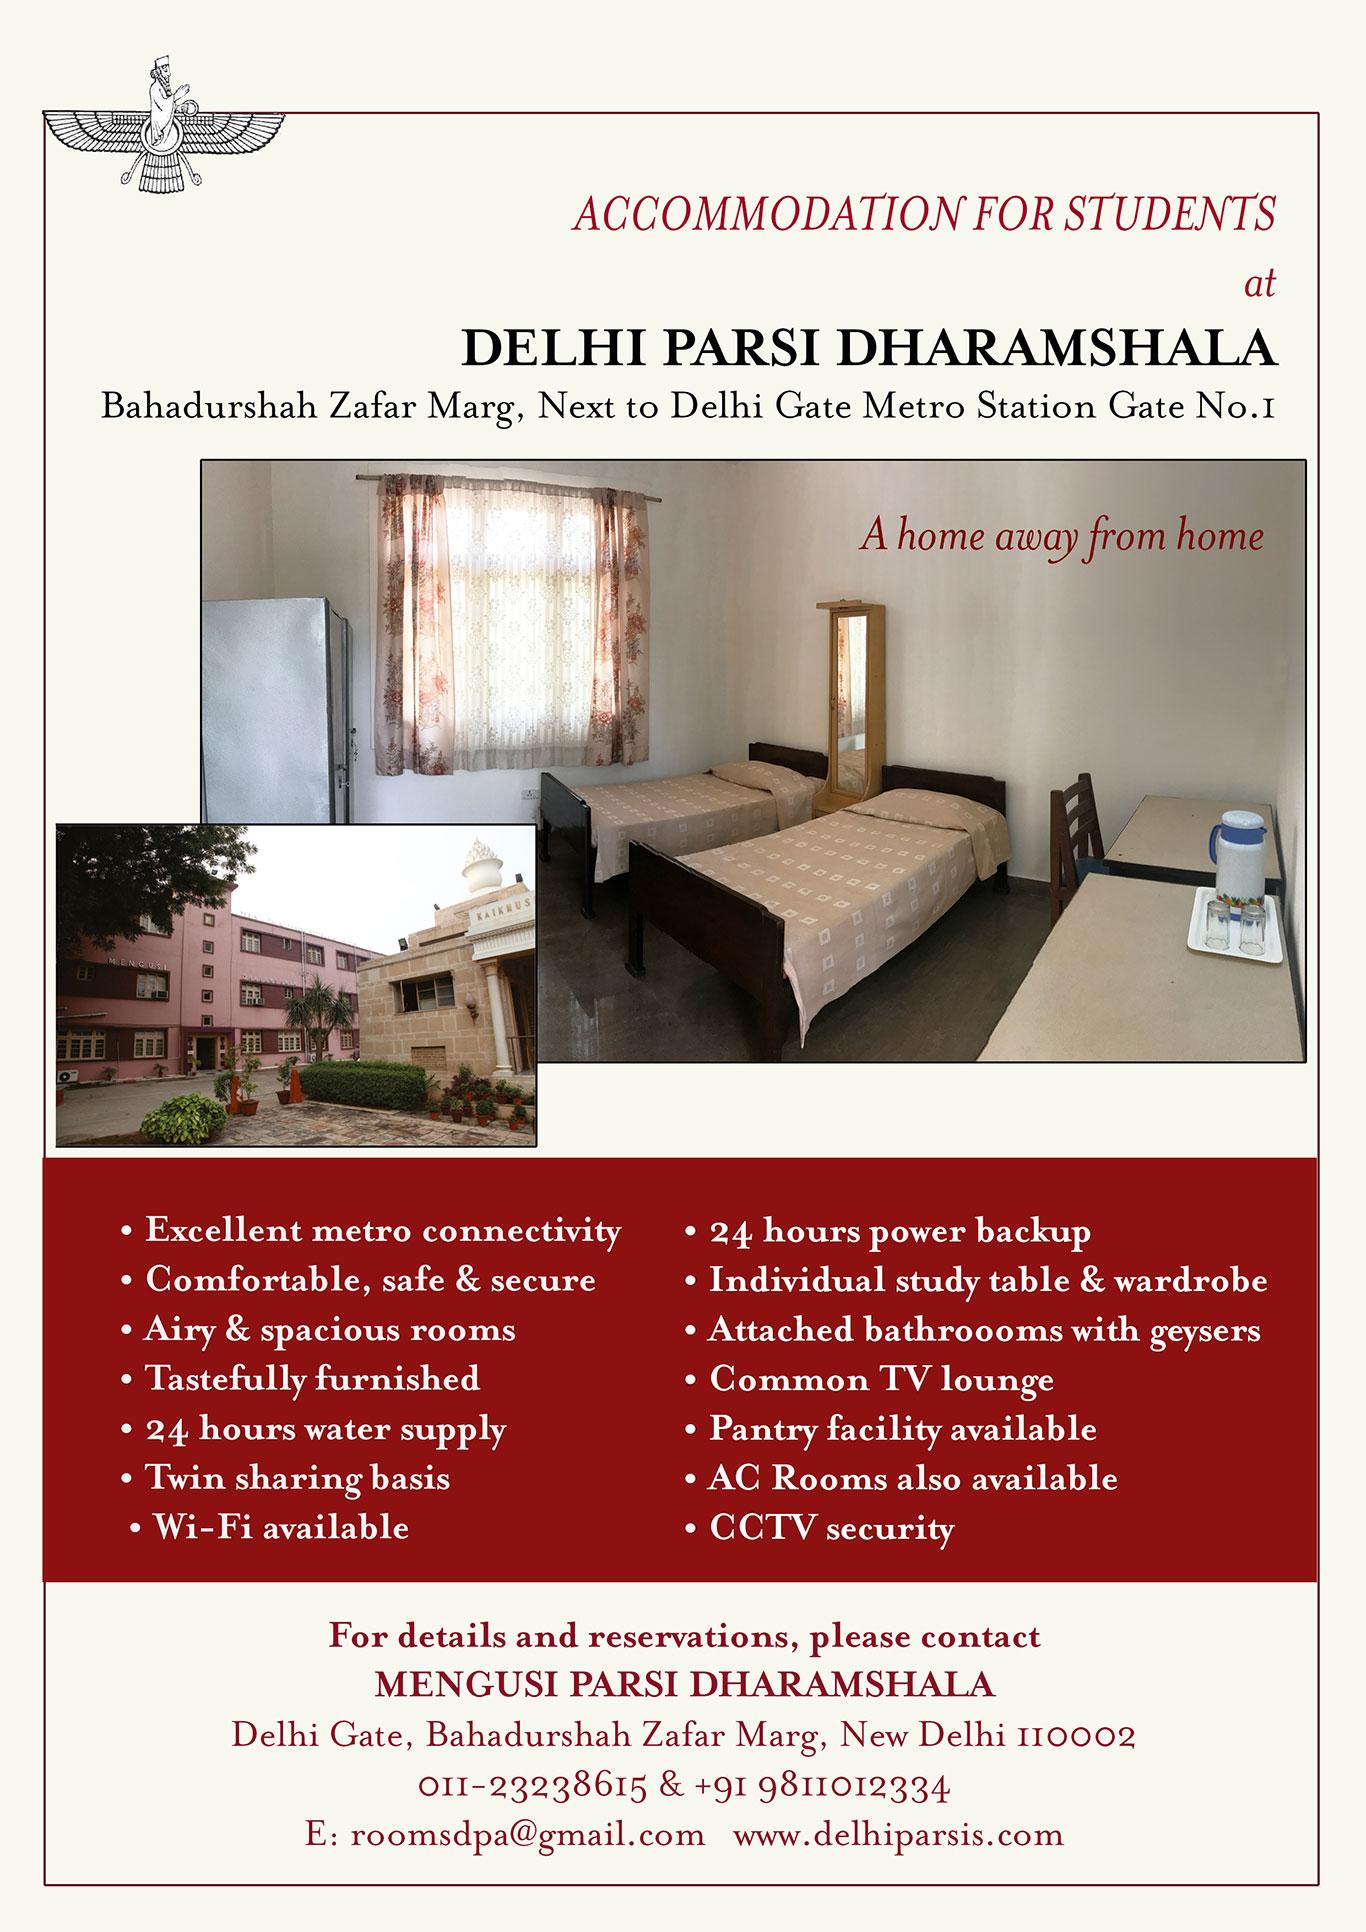 Delhi Parsi Dharamshala for Students